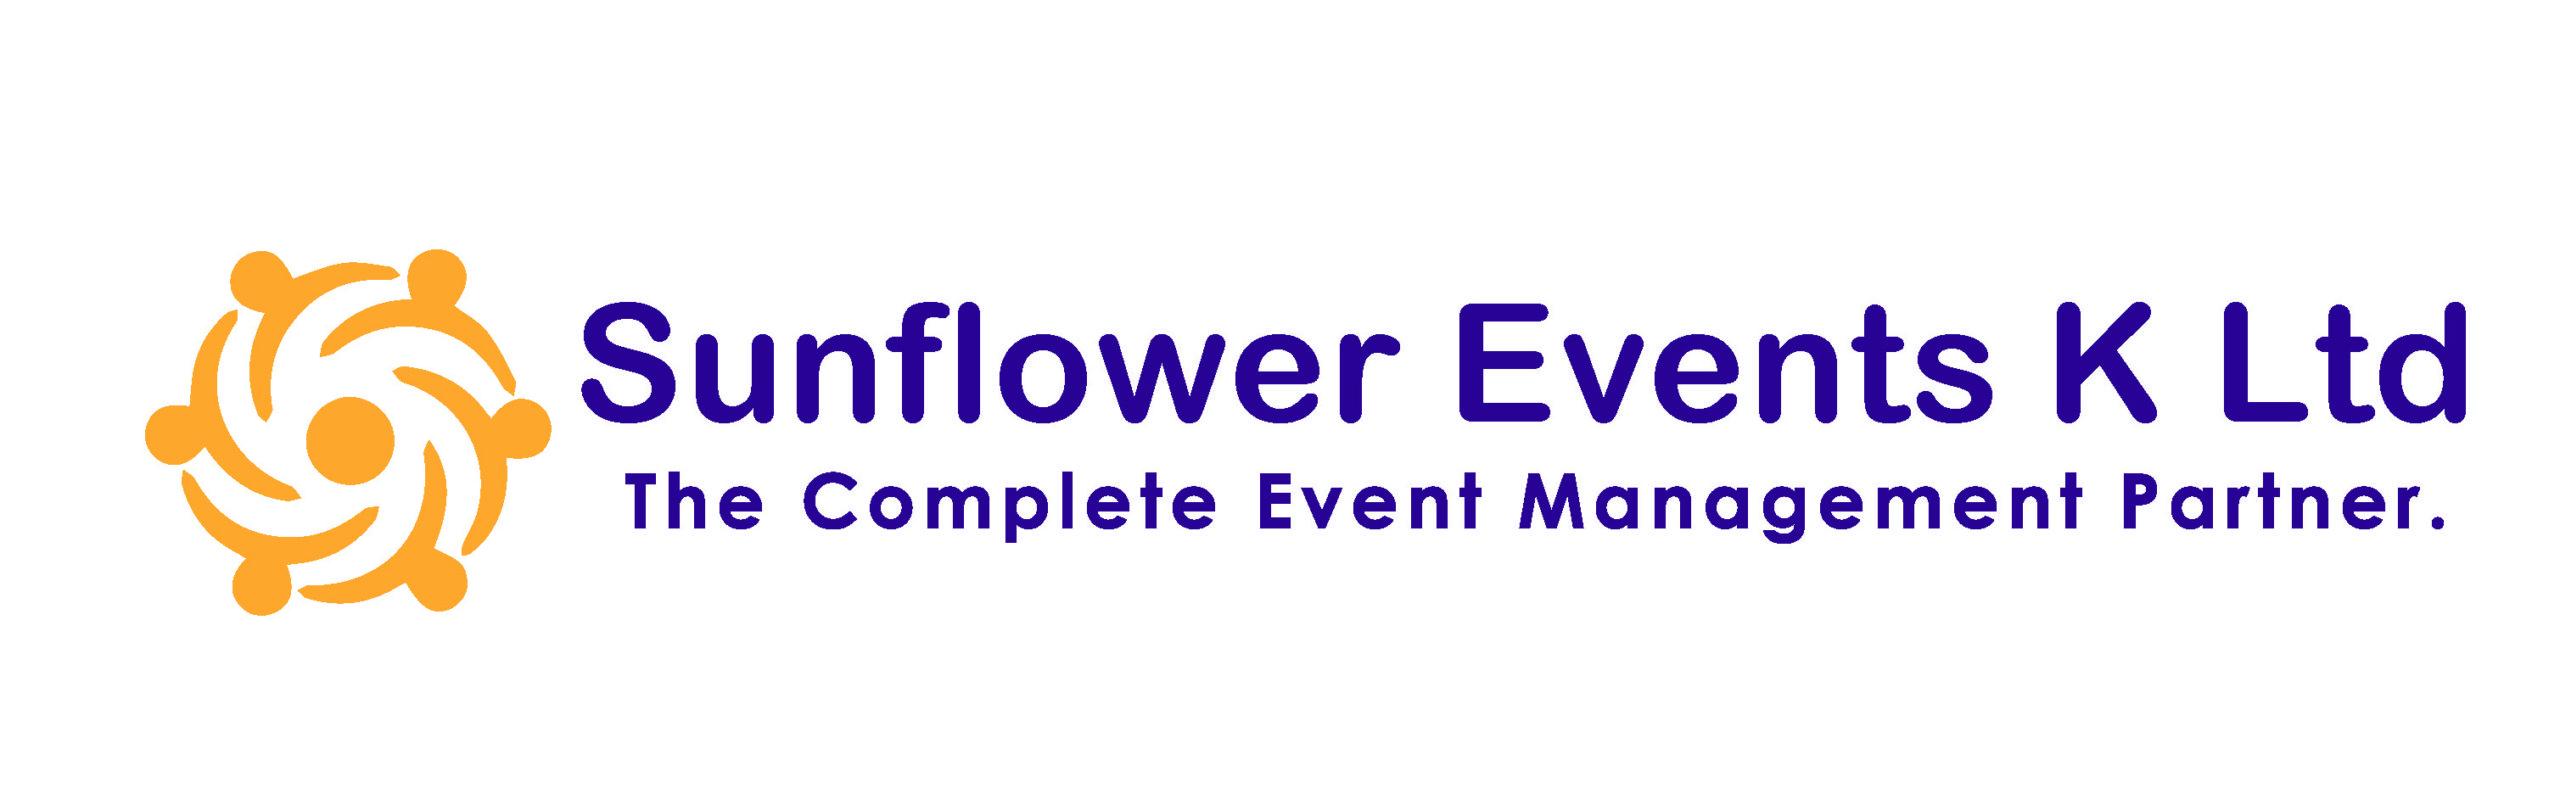 Sunflower Events Kenya Ltd